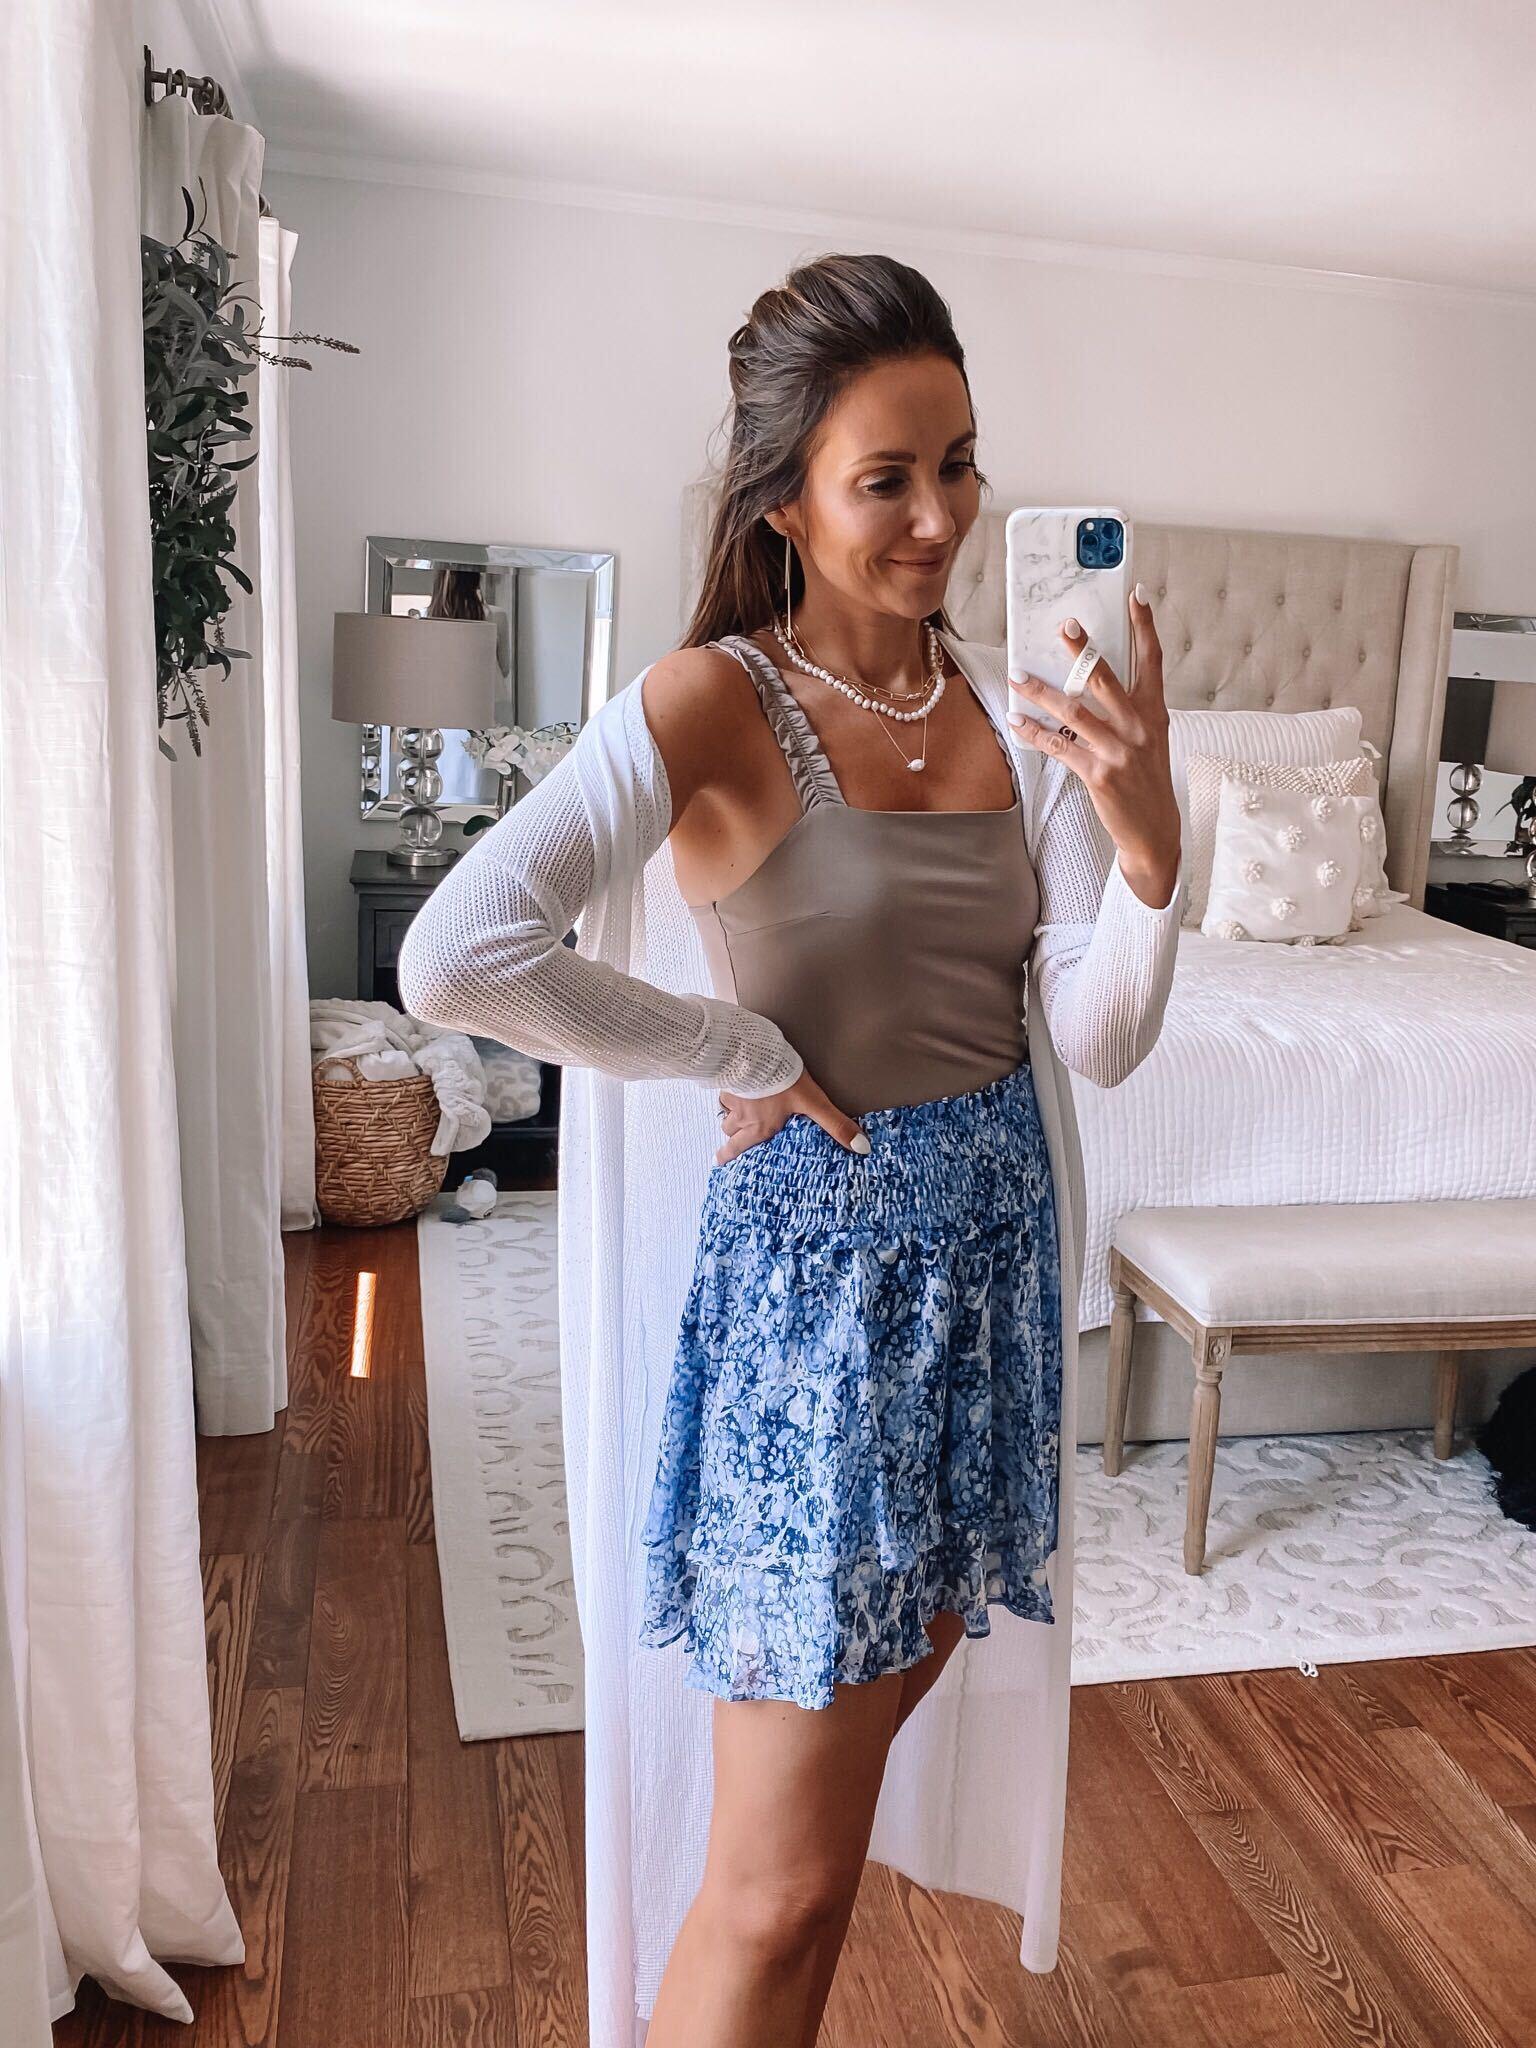 express shorts and top